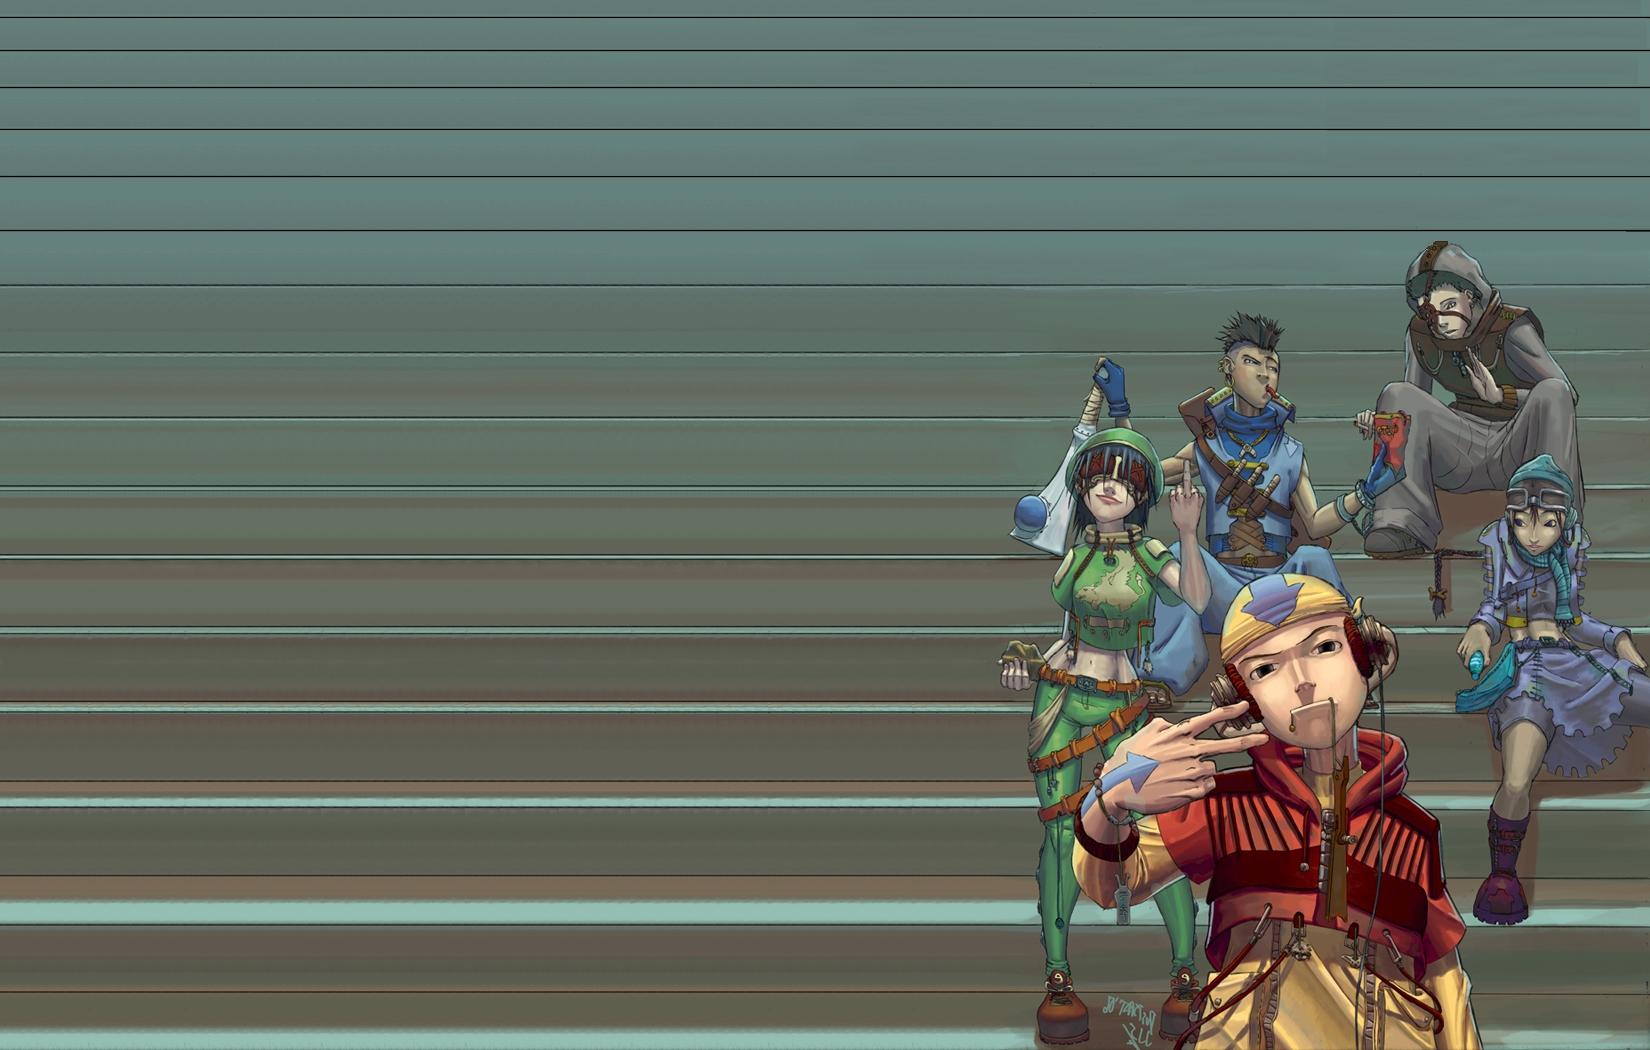 Avatar the last Airbender wallpaper (28)